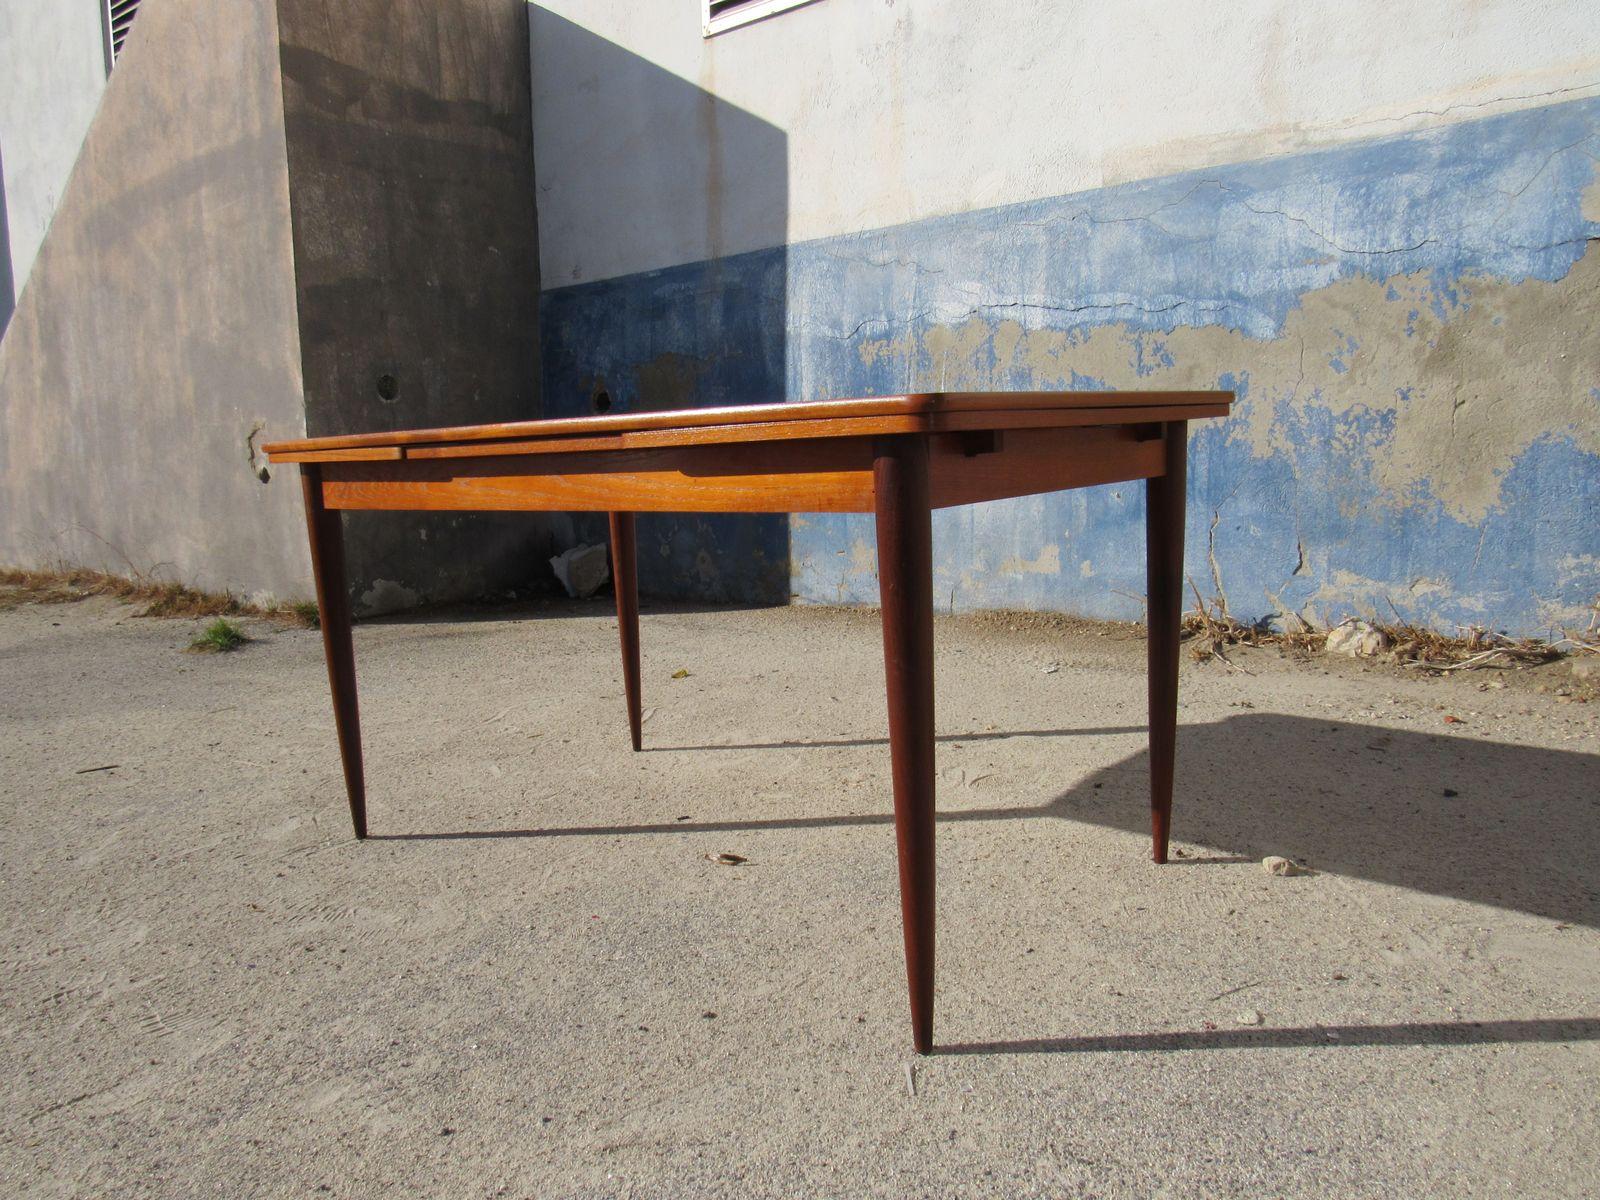 Table de salle manger mid century 1960s en vente sur pamono for Salle a manger annee 1960